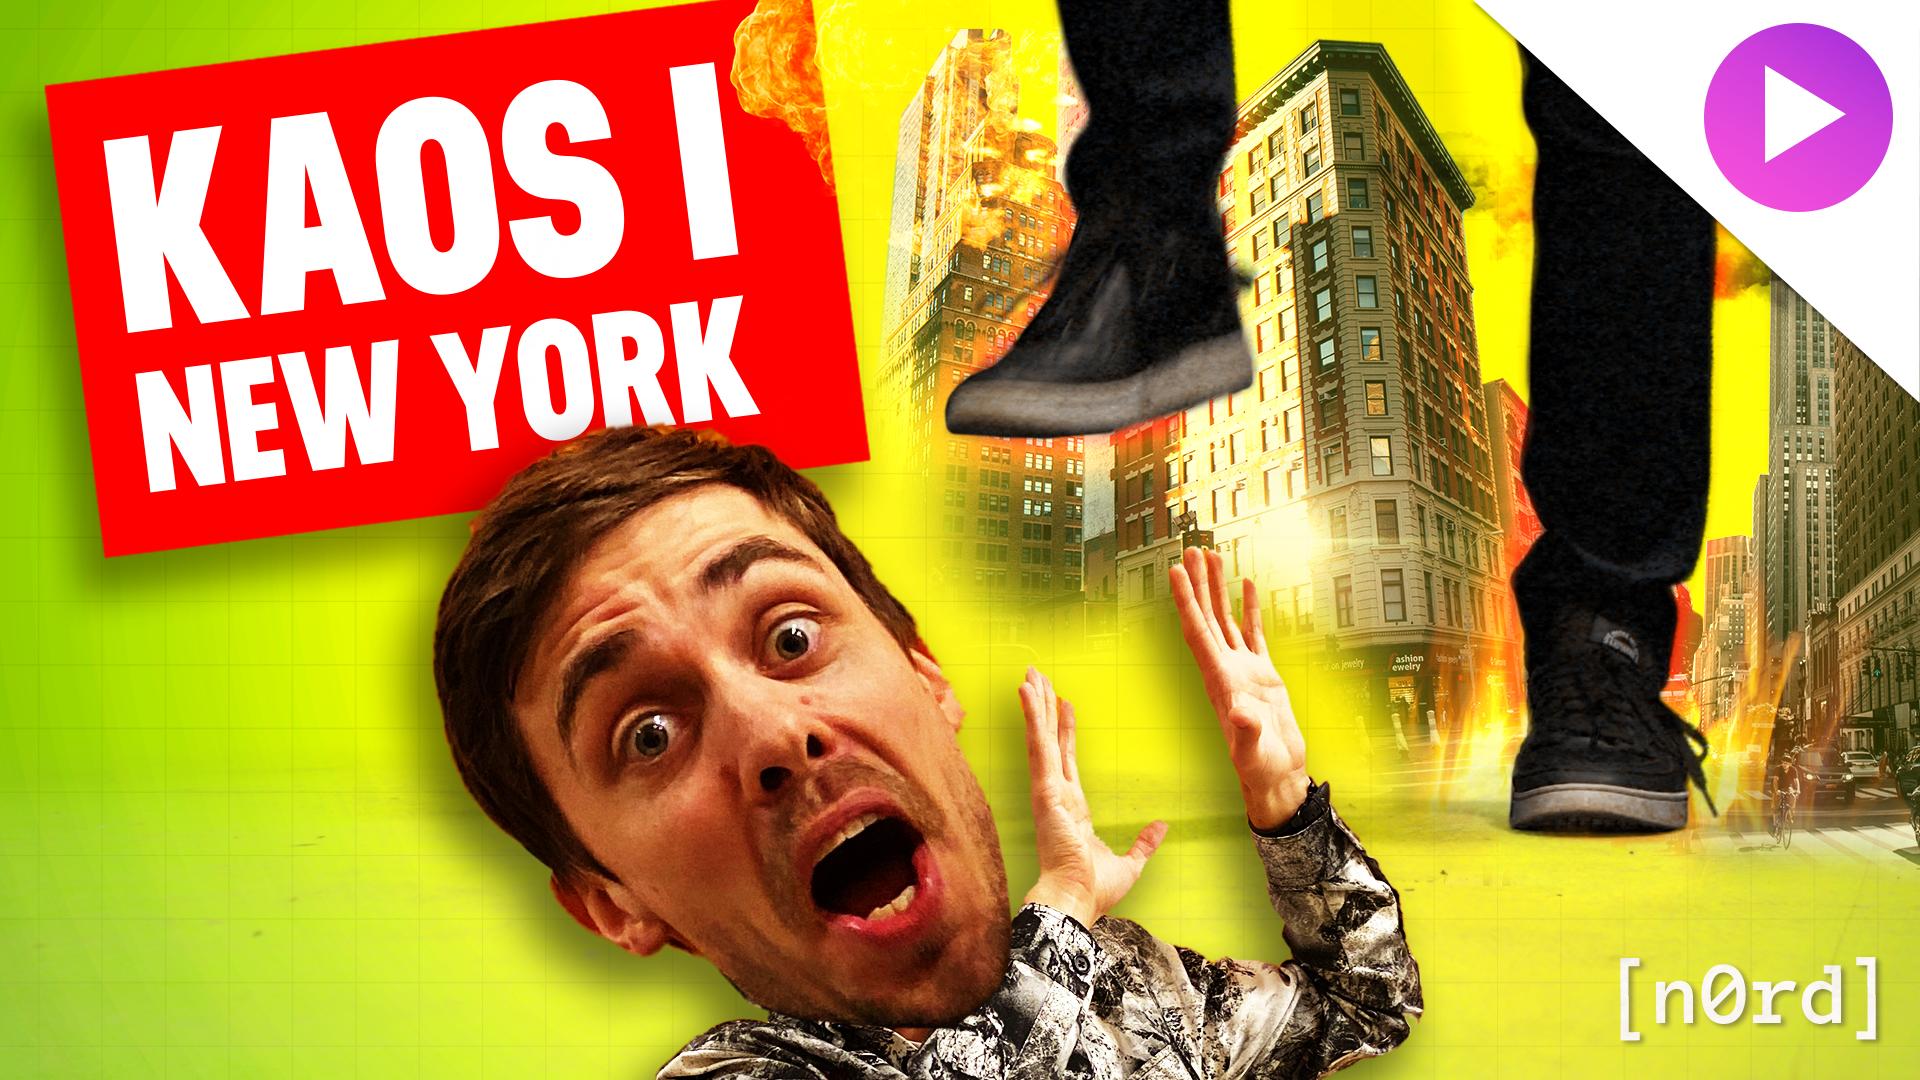 noerd_kaos_i_new_york_drupal.png